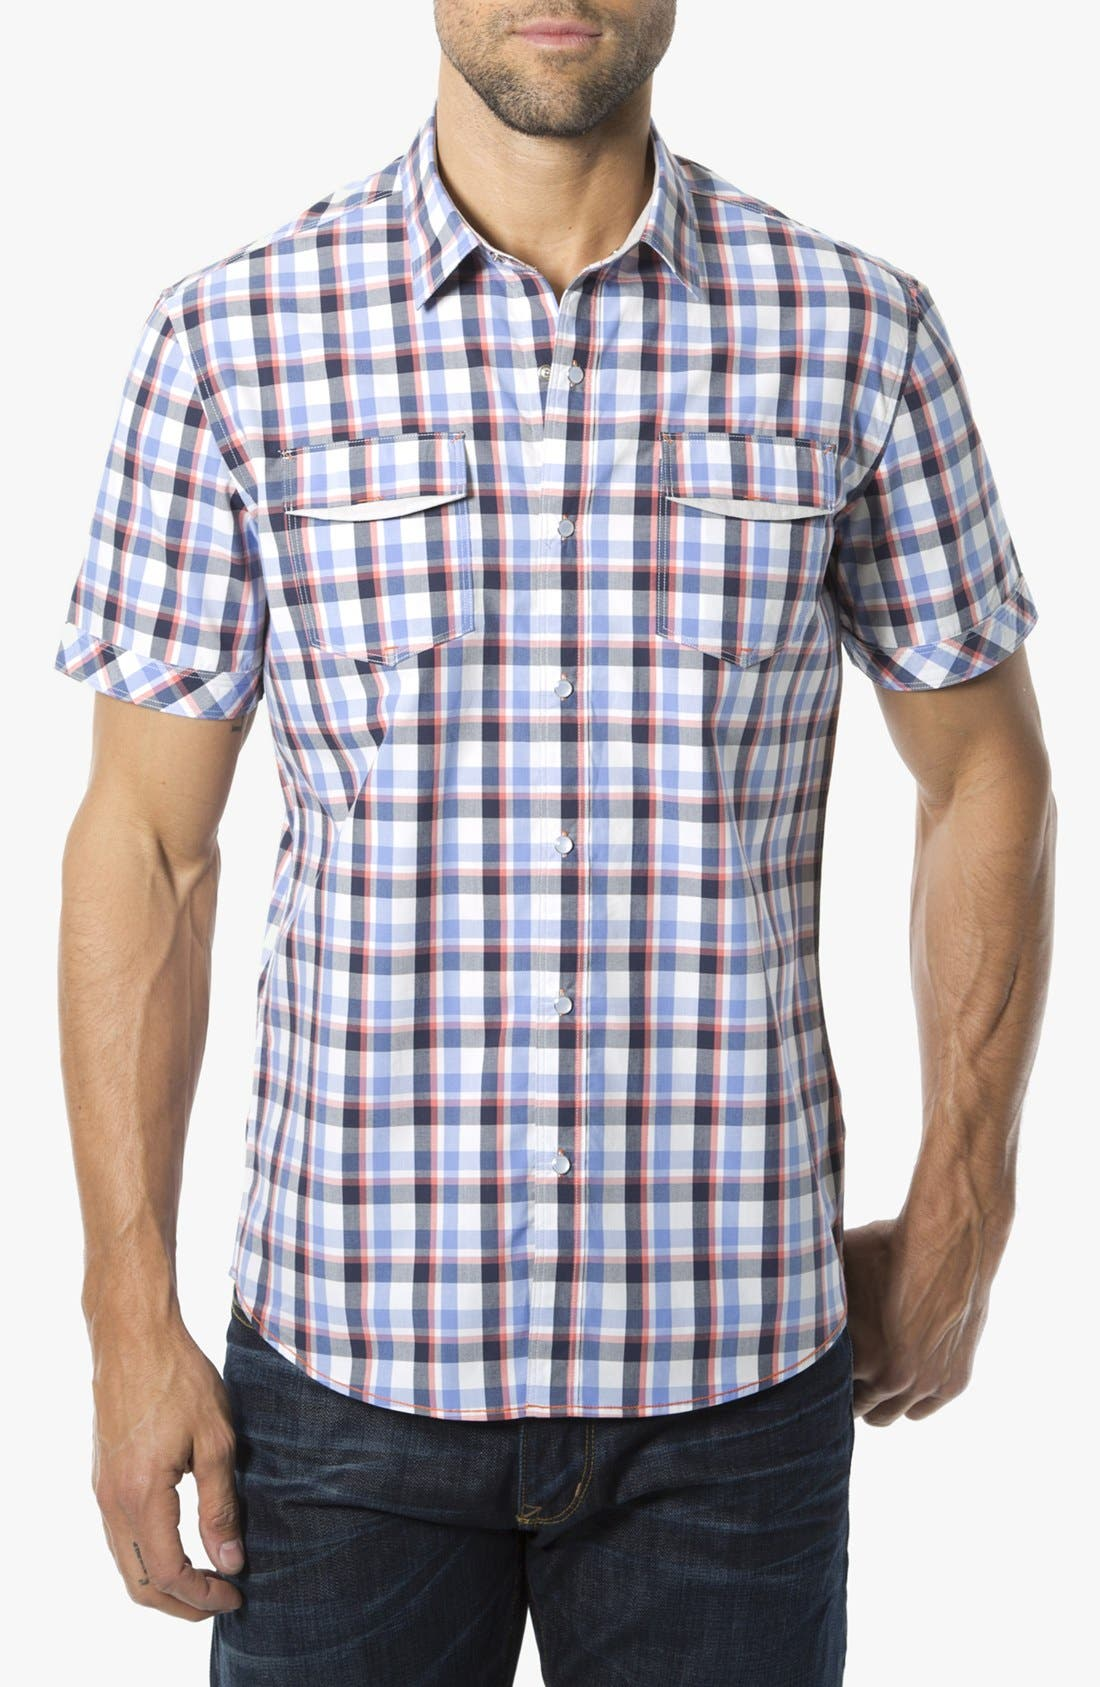 Main Image - 7 Diamonds 'Quick Exit' Woven Short Sleeve Shirt